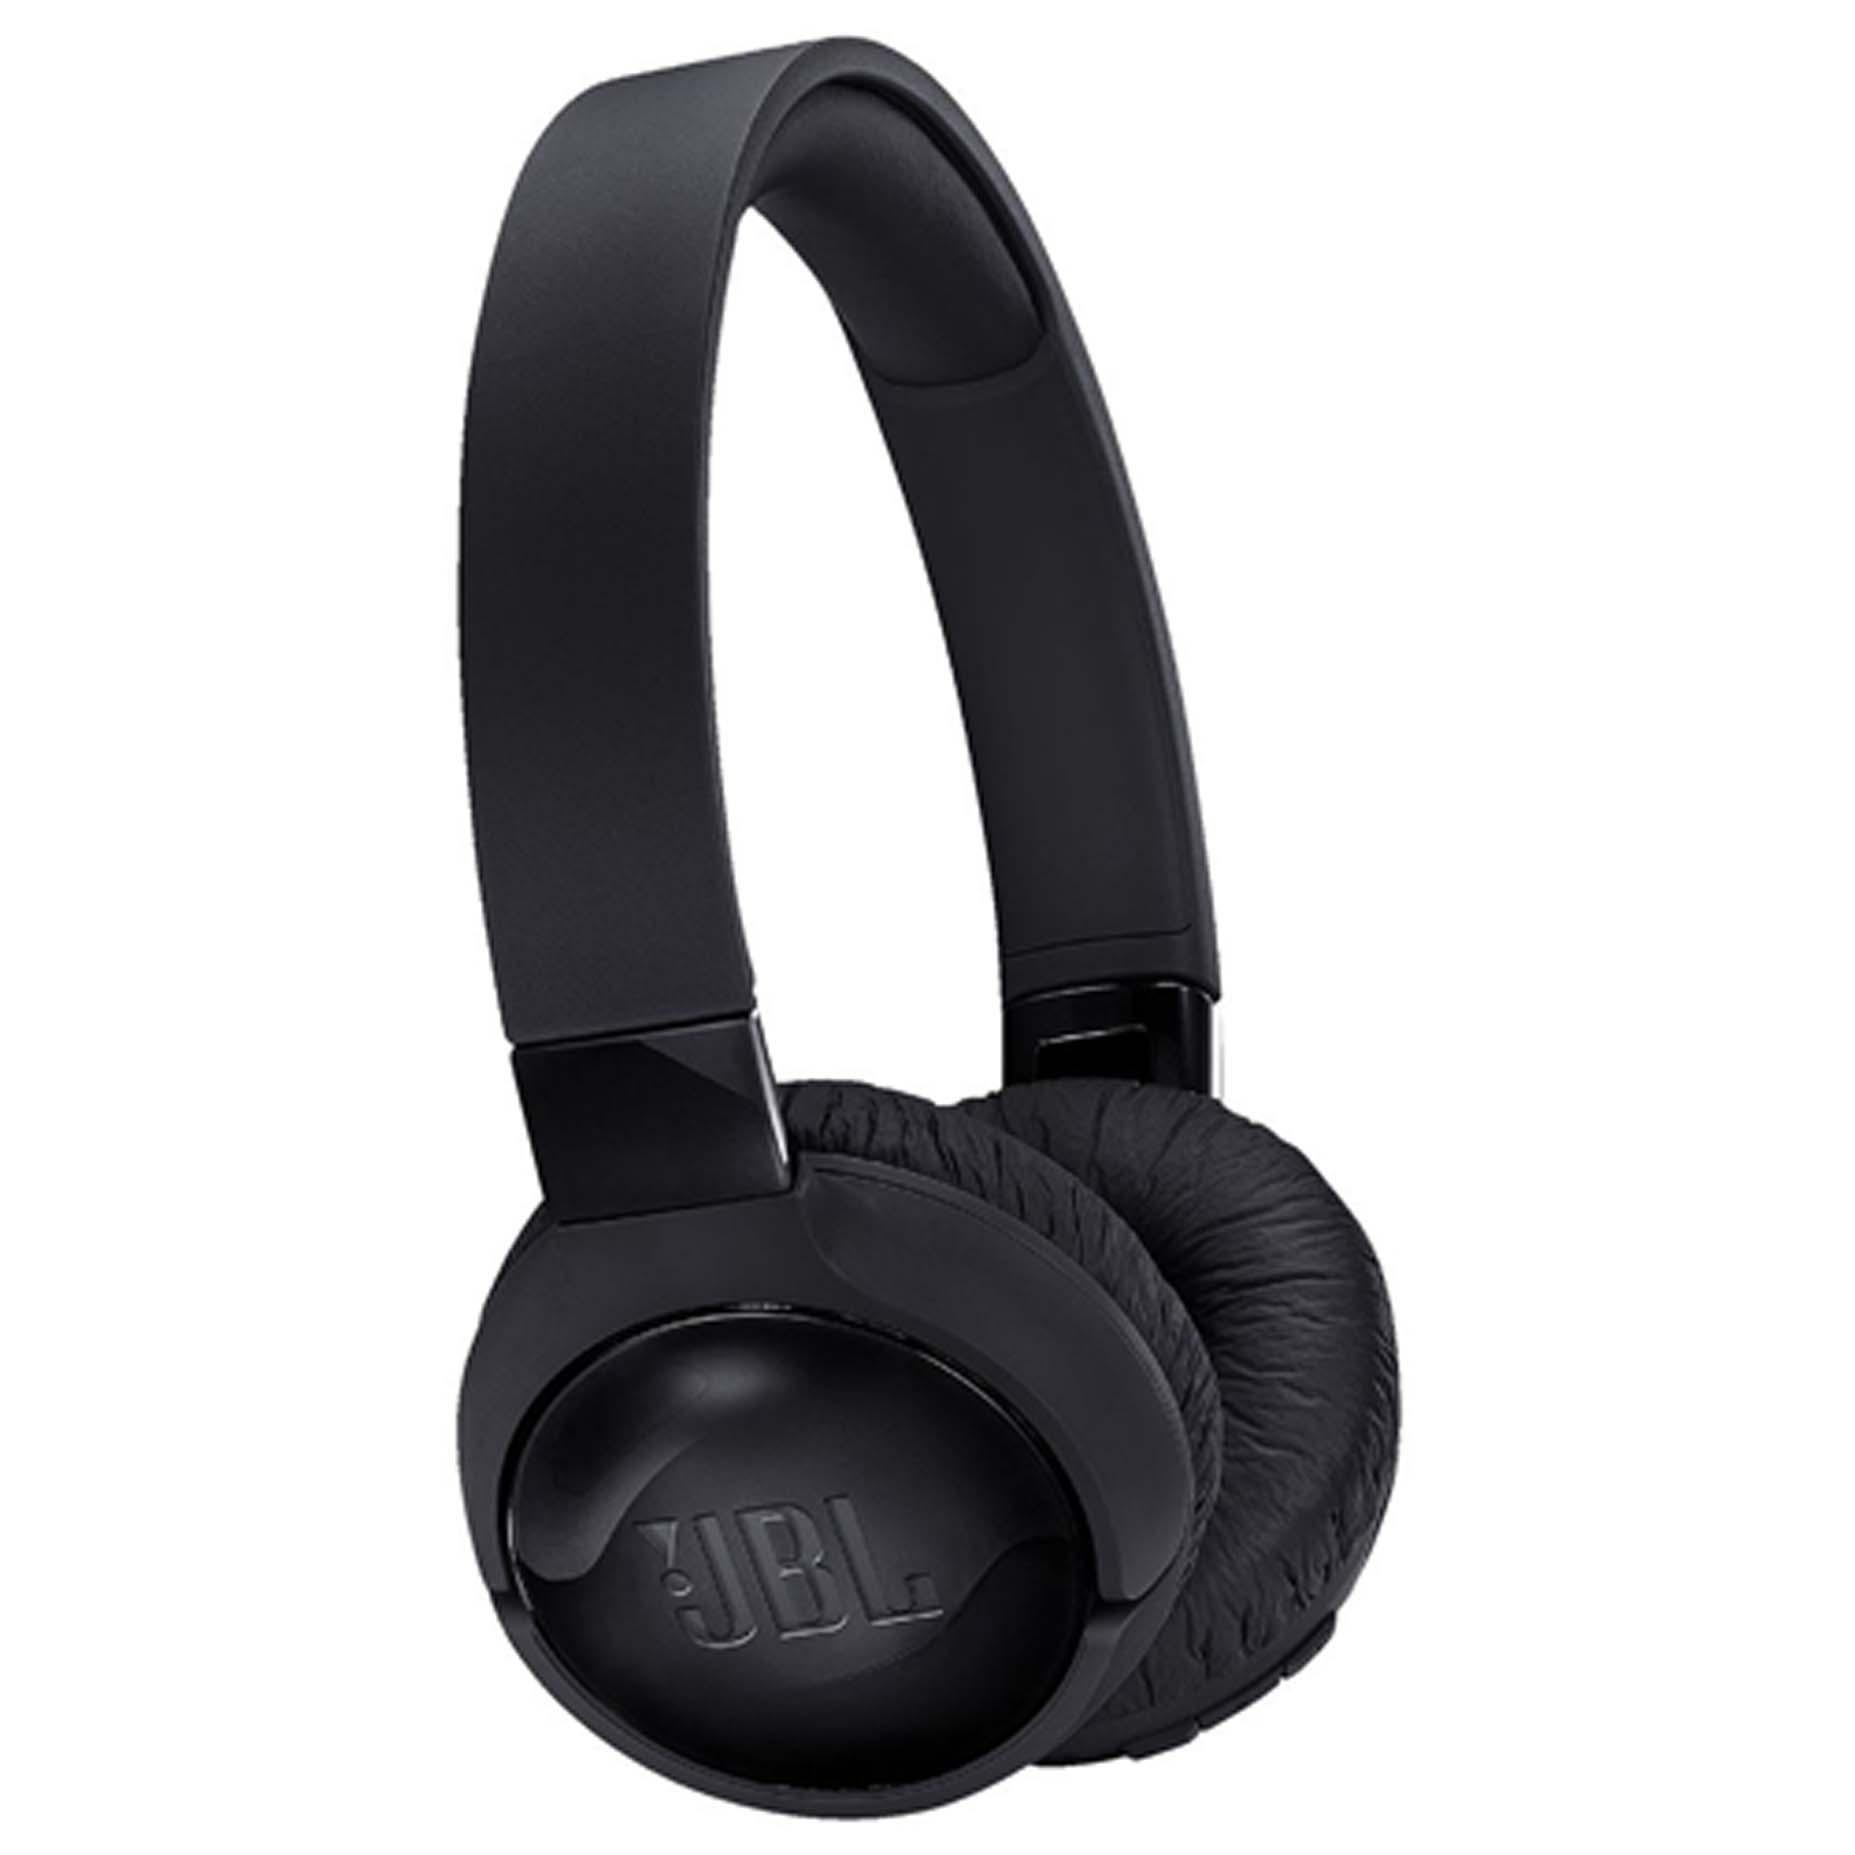 Harga JBL TUNE 600BTNC Headphone On-ear Nirkabel